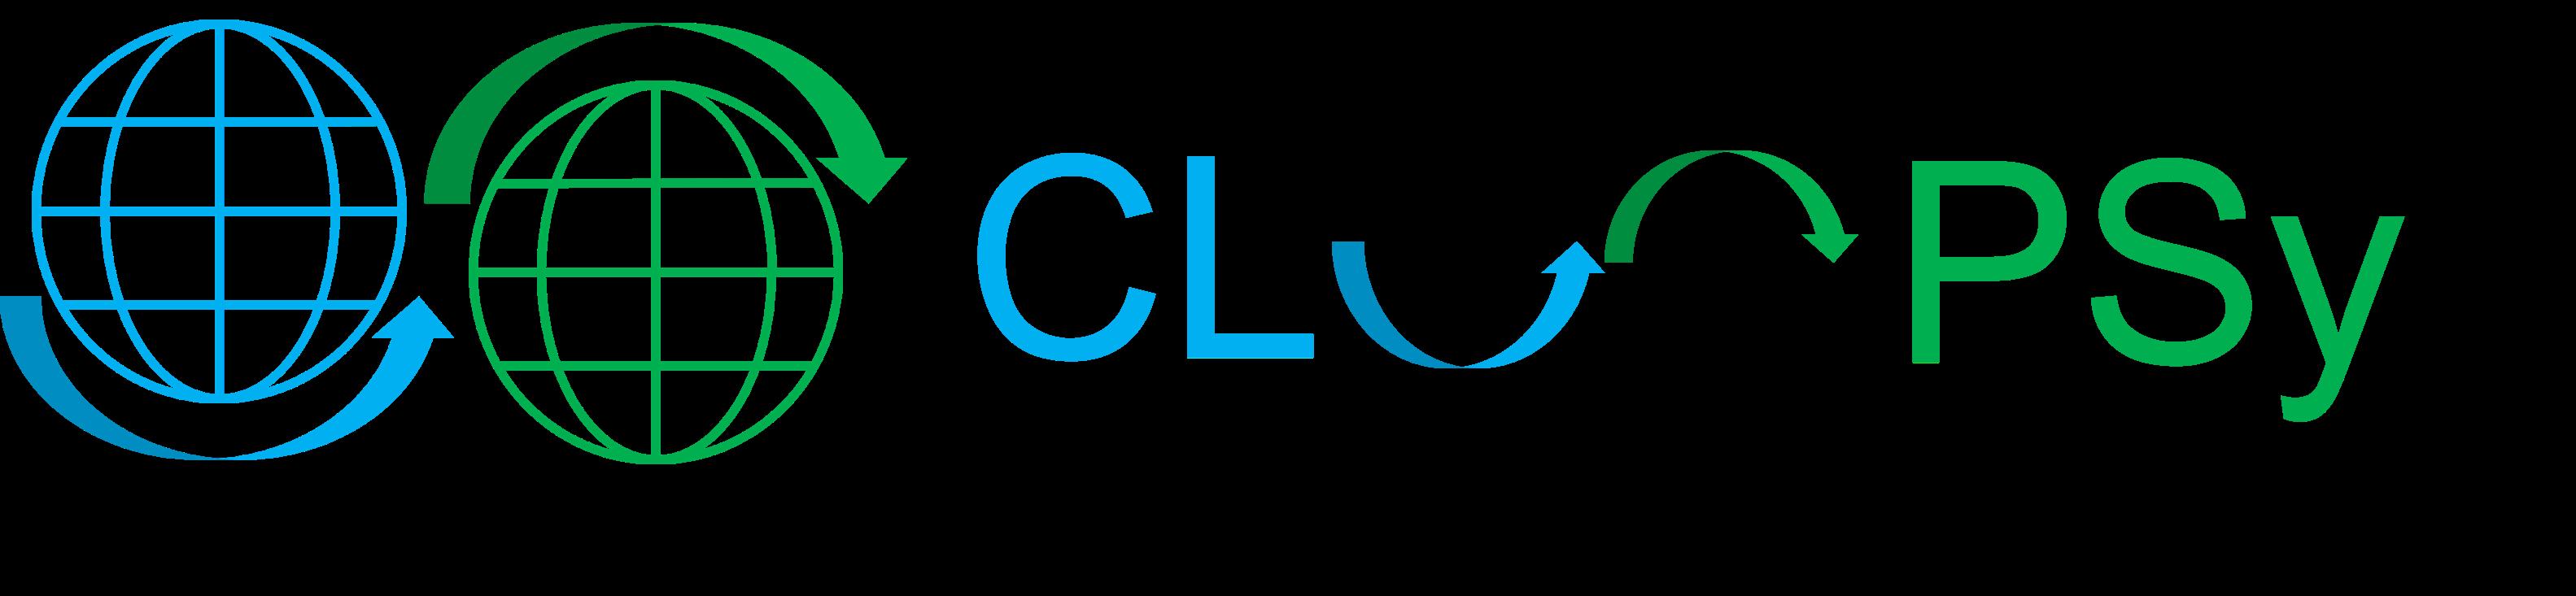 CLOOPSy logo.